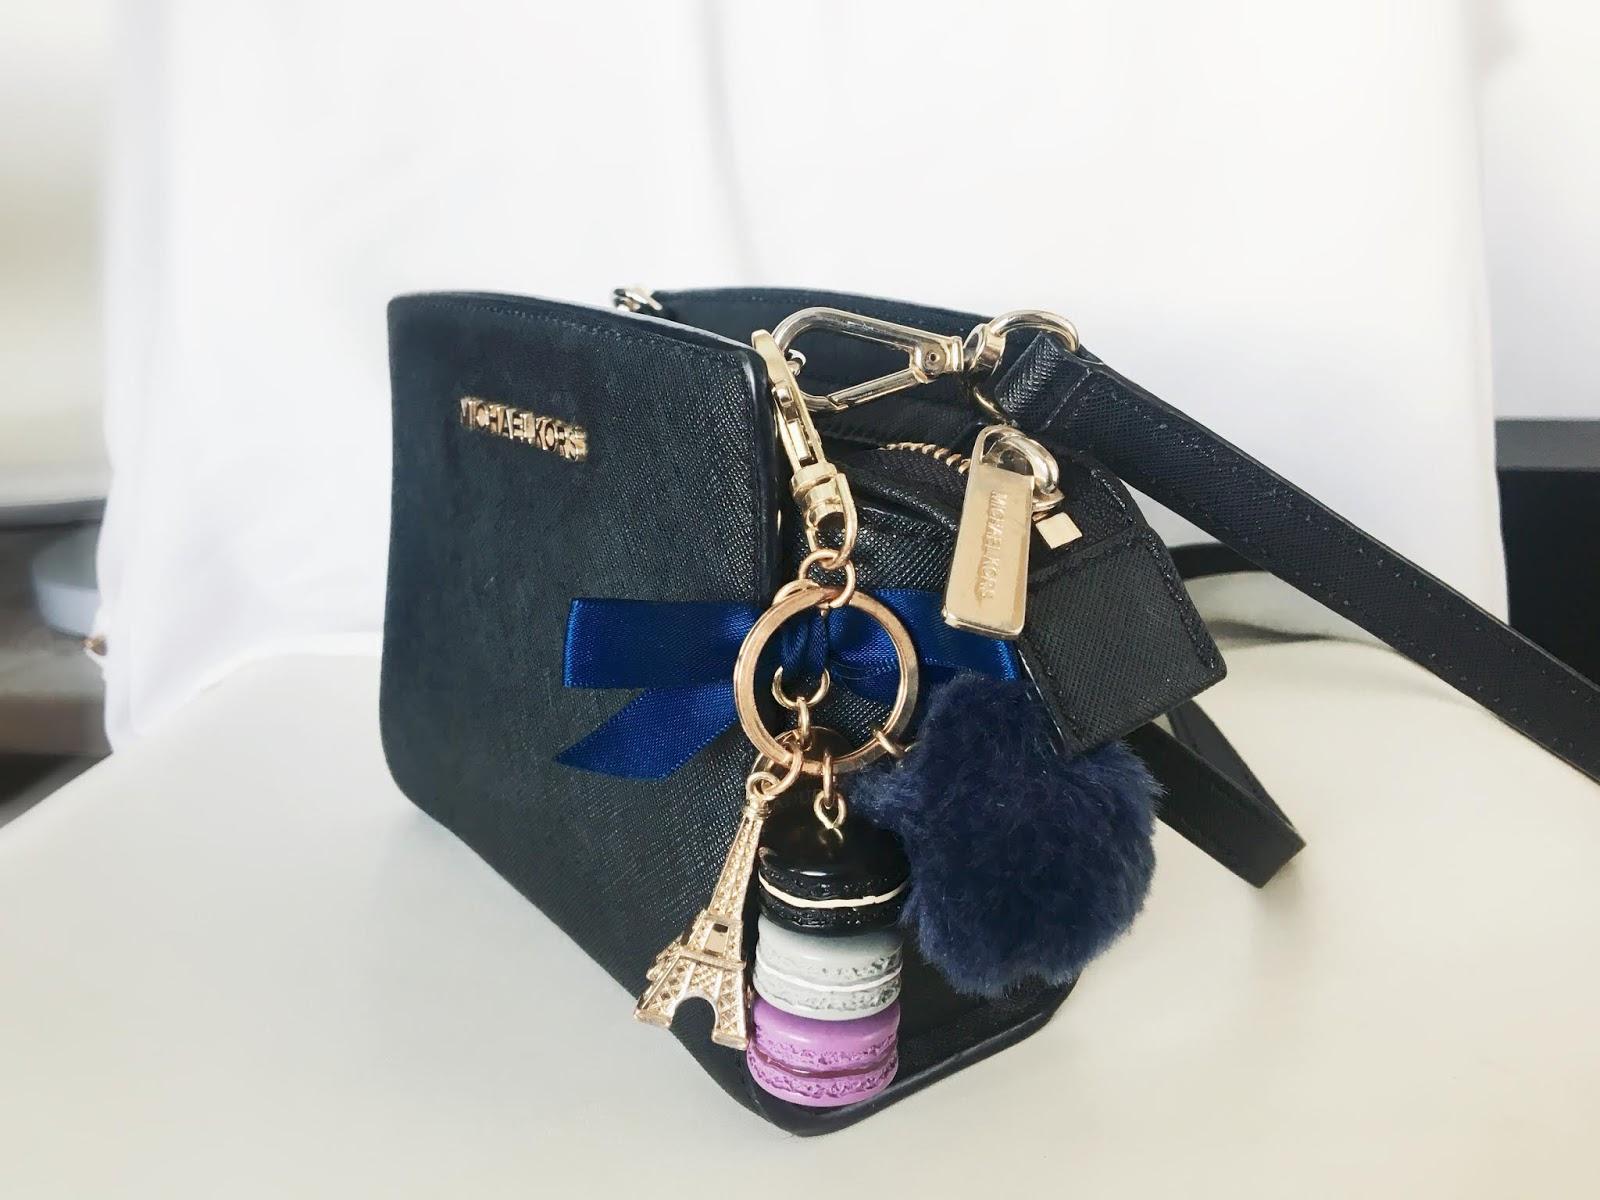 c3894f5719ec5 Michael Kors Selma Mini Crossbody Messenger Bag Review - A Blog by ...